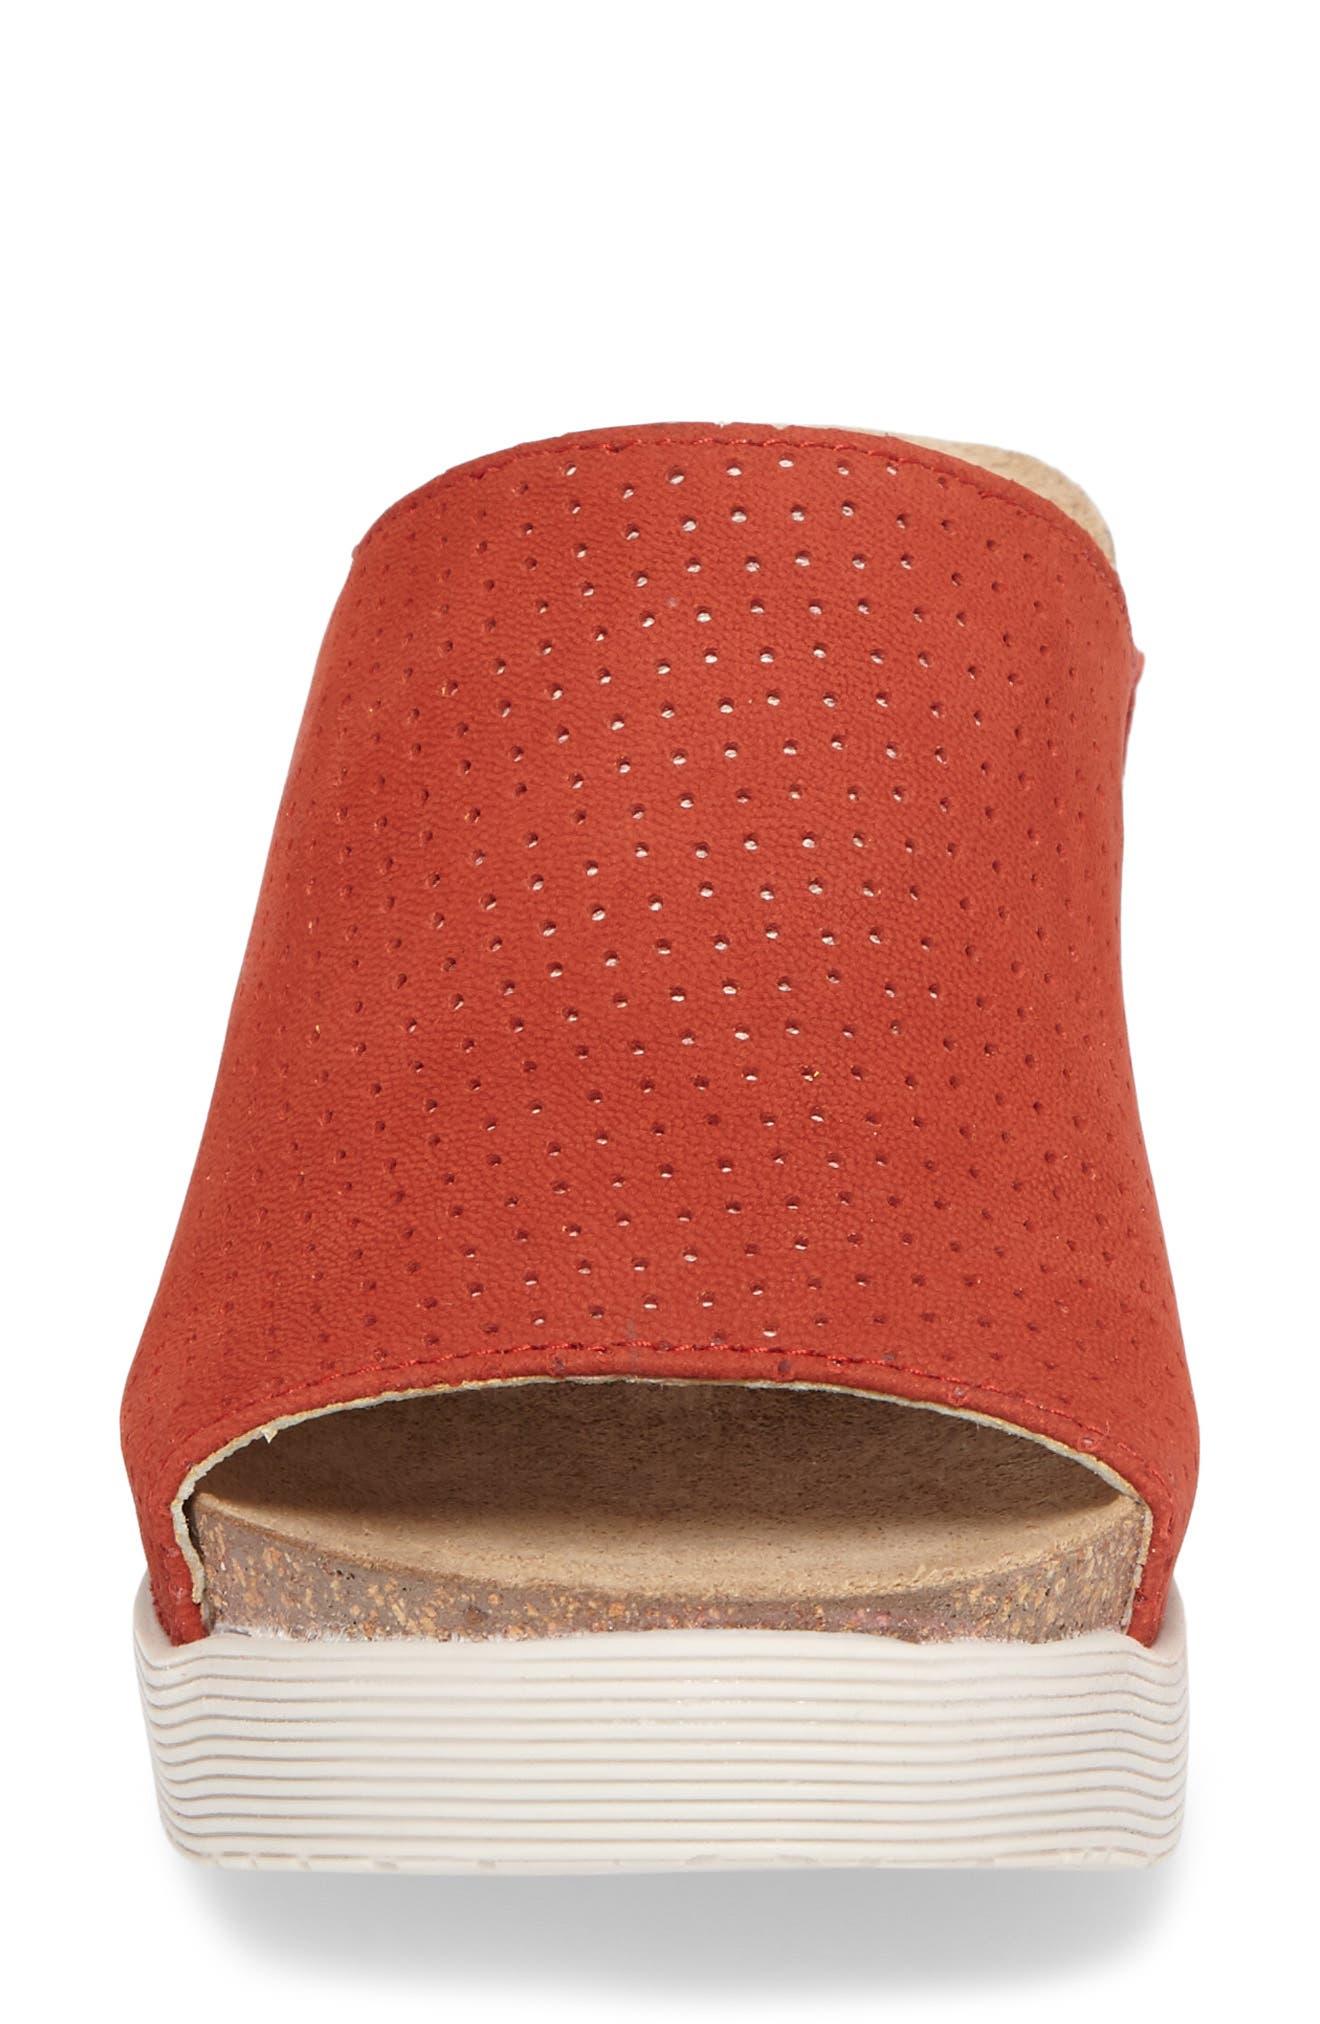 Whin Platform Sandal,                             Alternate thumbnail 4, color,                             Scarlet Cupido Leather